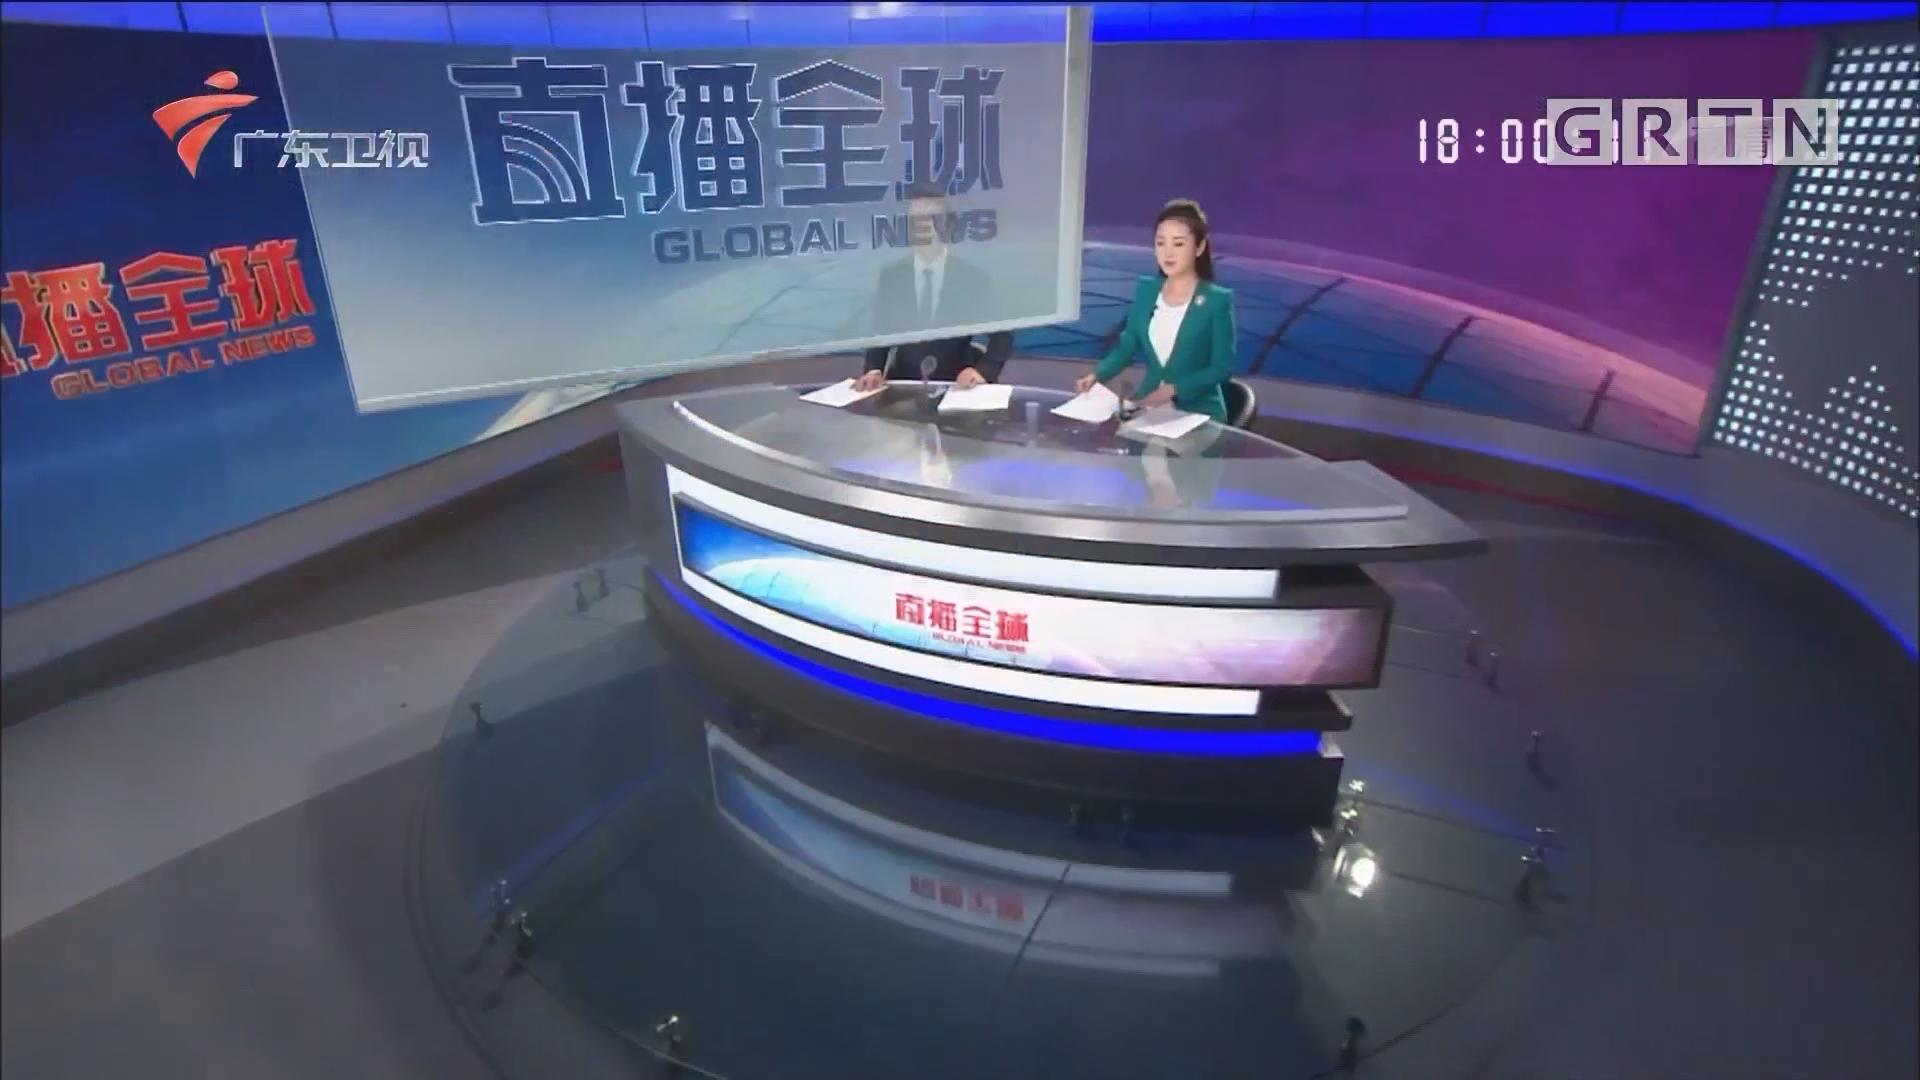 [HD][2018-01-11]直播全球:习近平向武警部队授旗并致训词